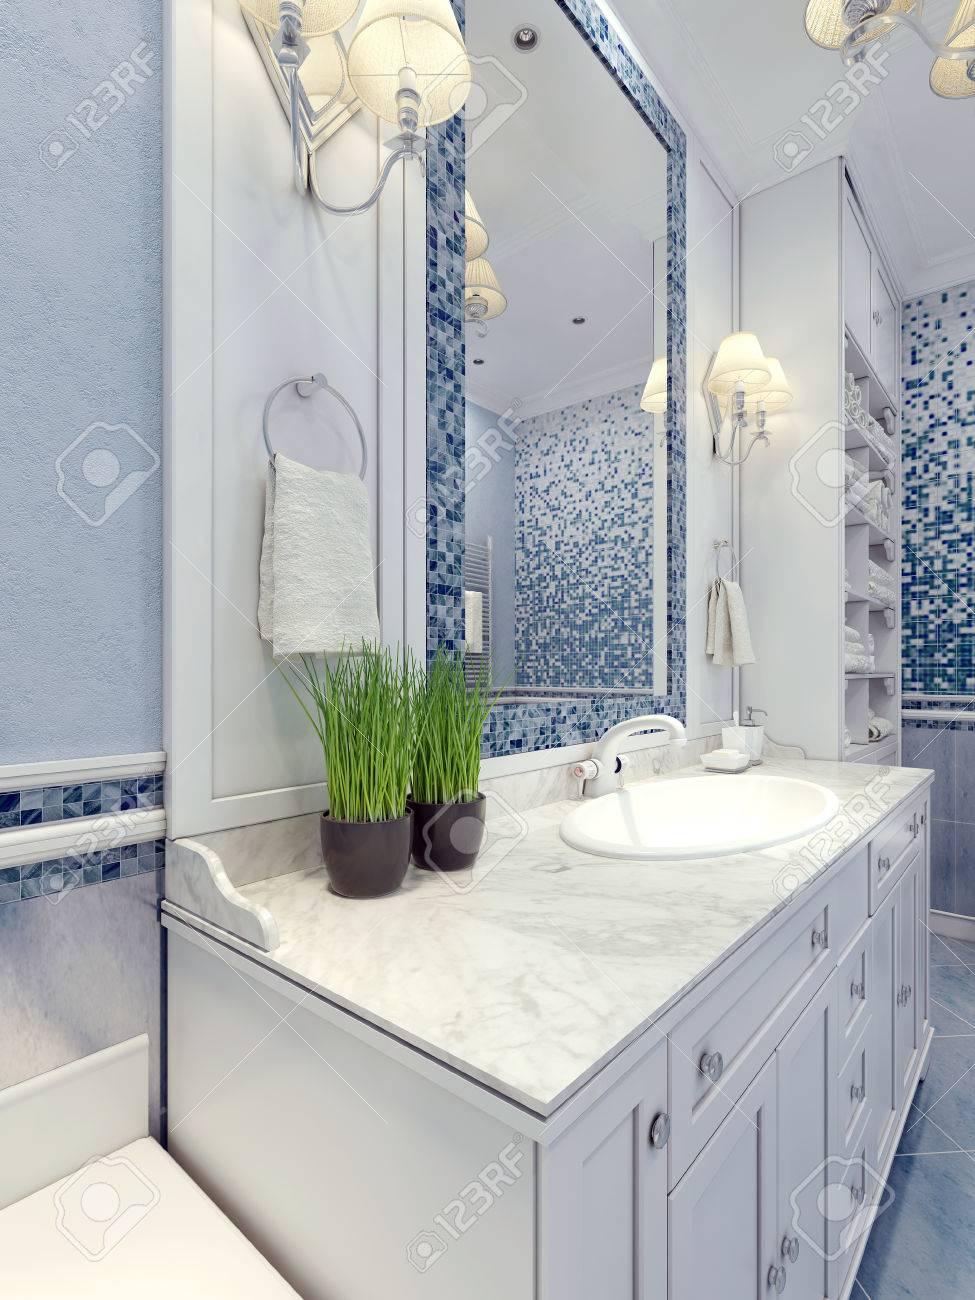 provence salle de bain bleu tendance meubles de salle blanche un grand miroir avec cadre mosaique de bleu blanc consoles melangeur d evier 3d